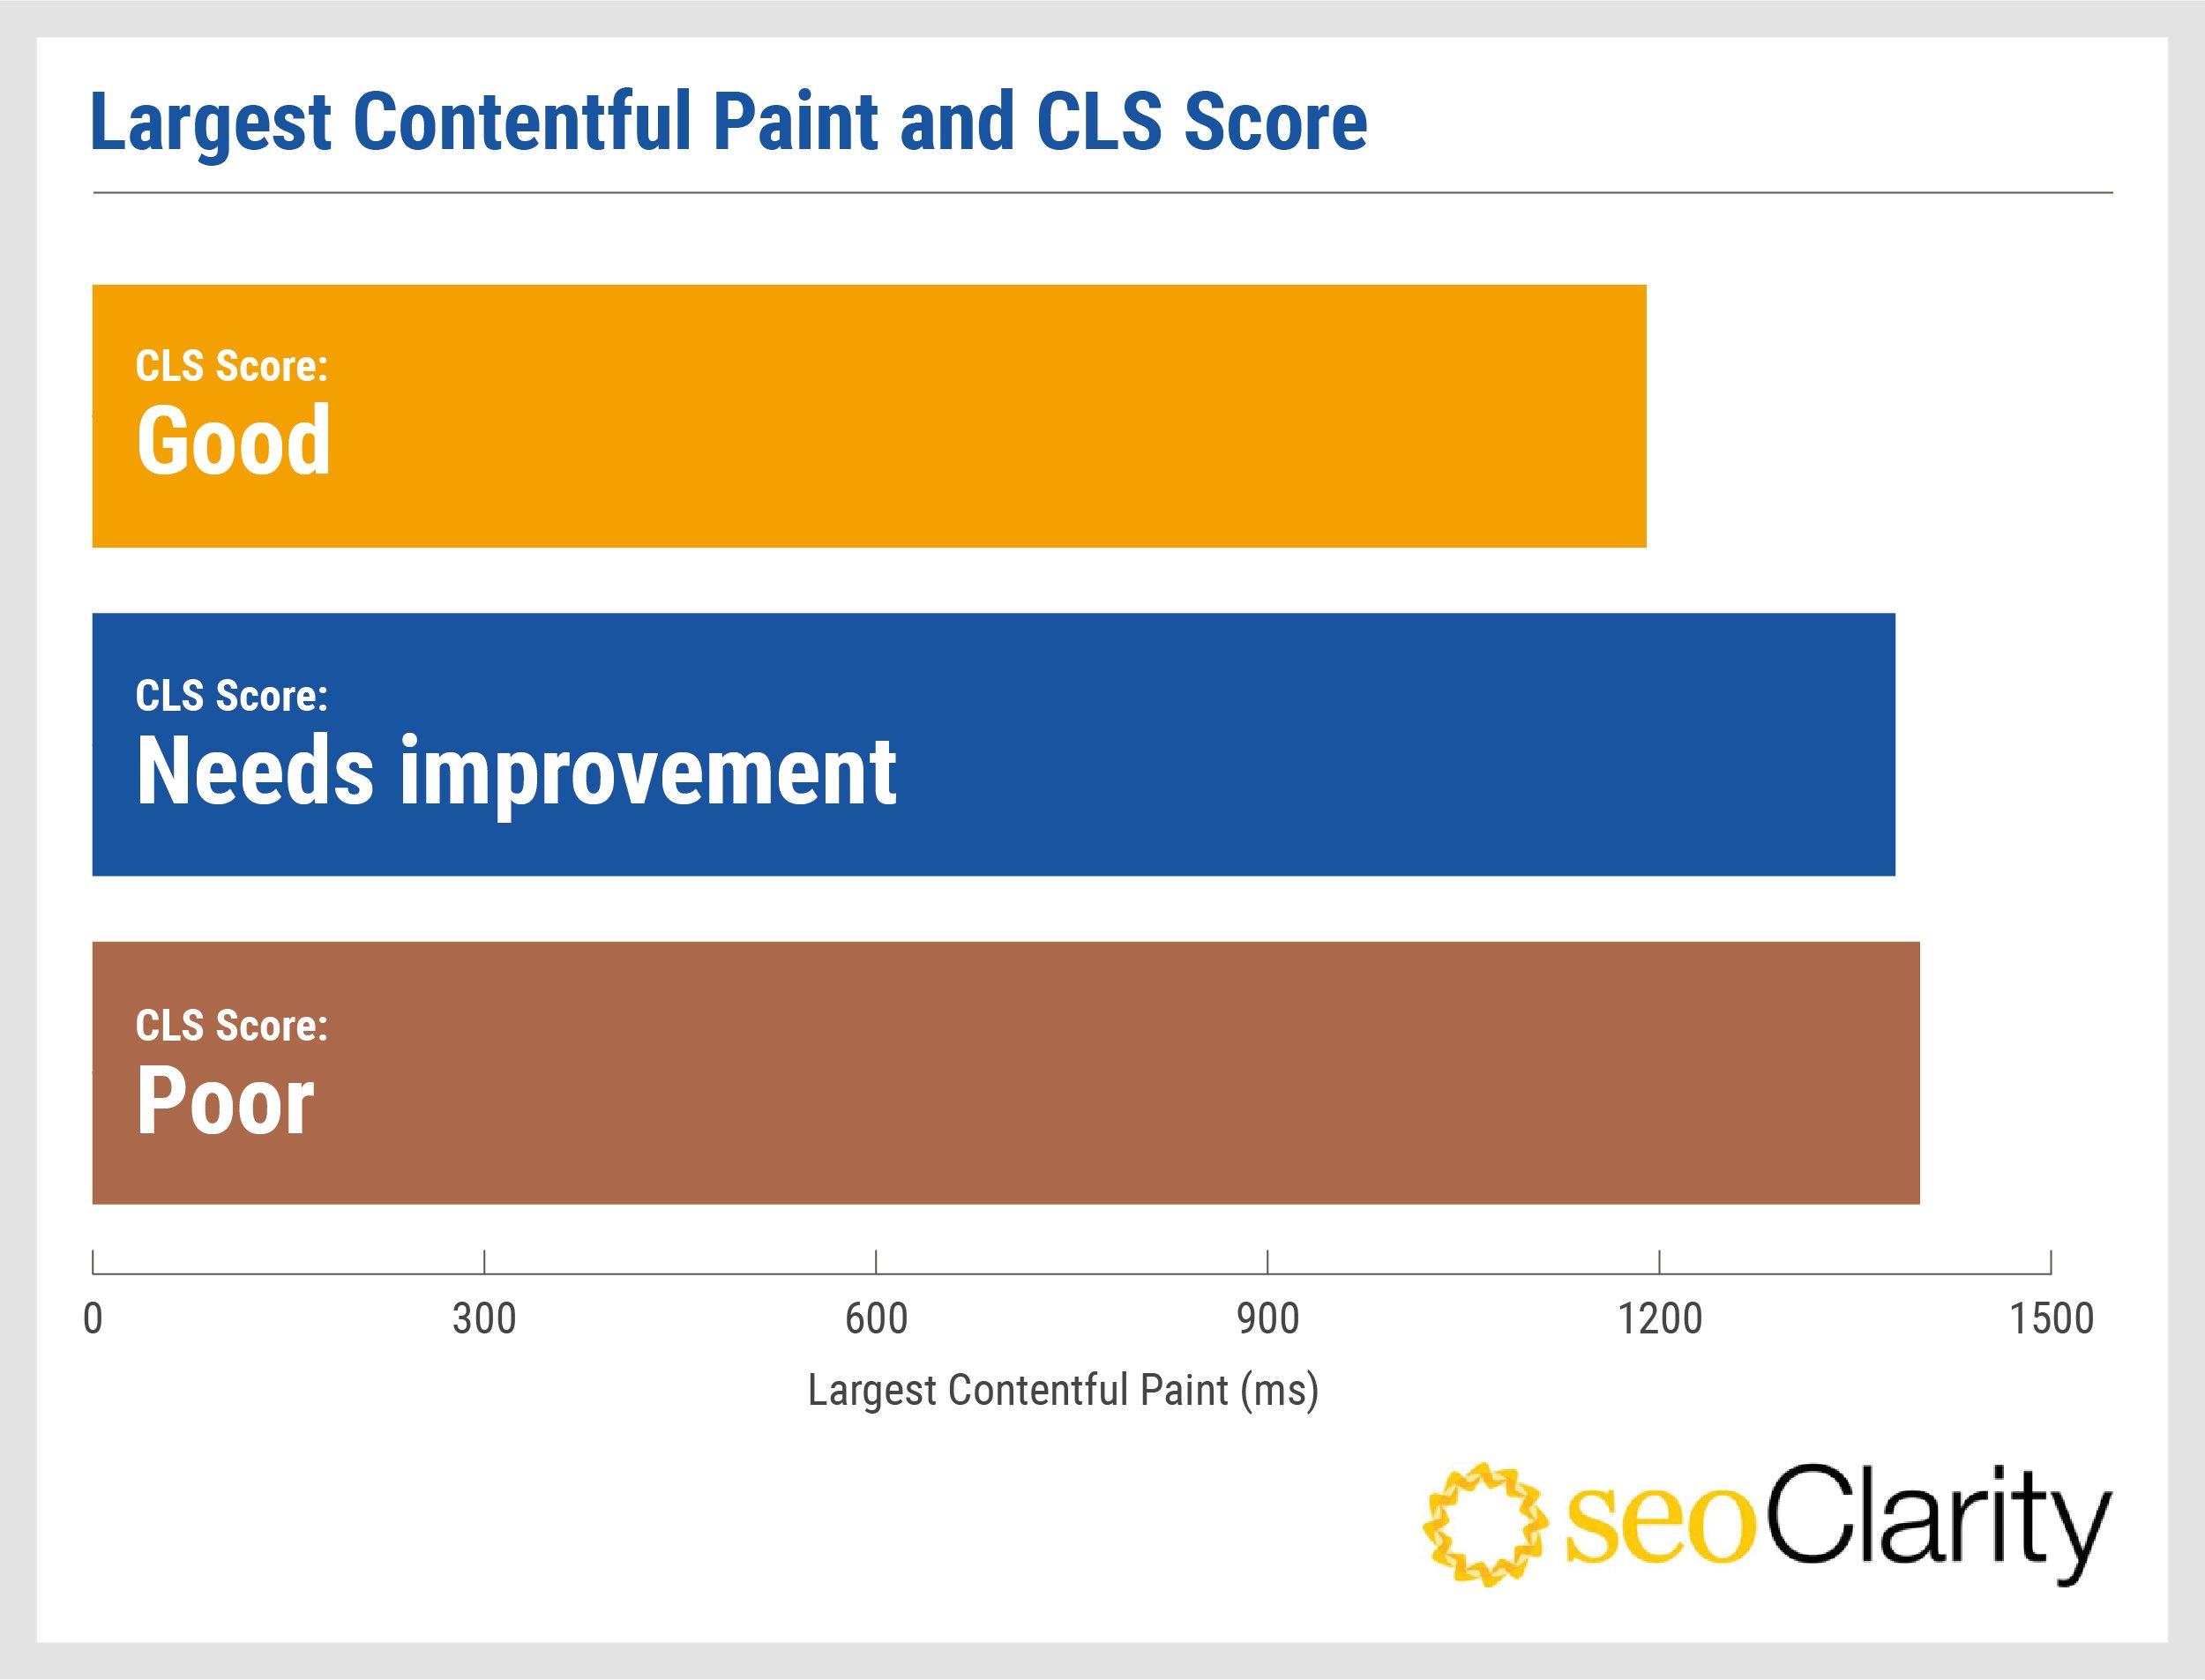 seoclarity-largest-contentful-paint-cls-score